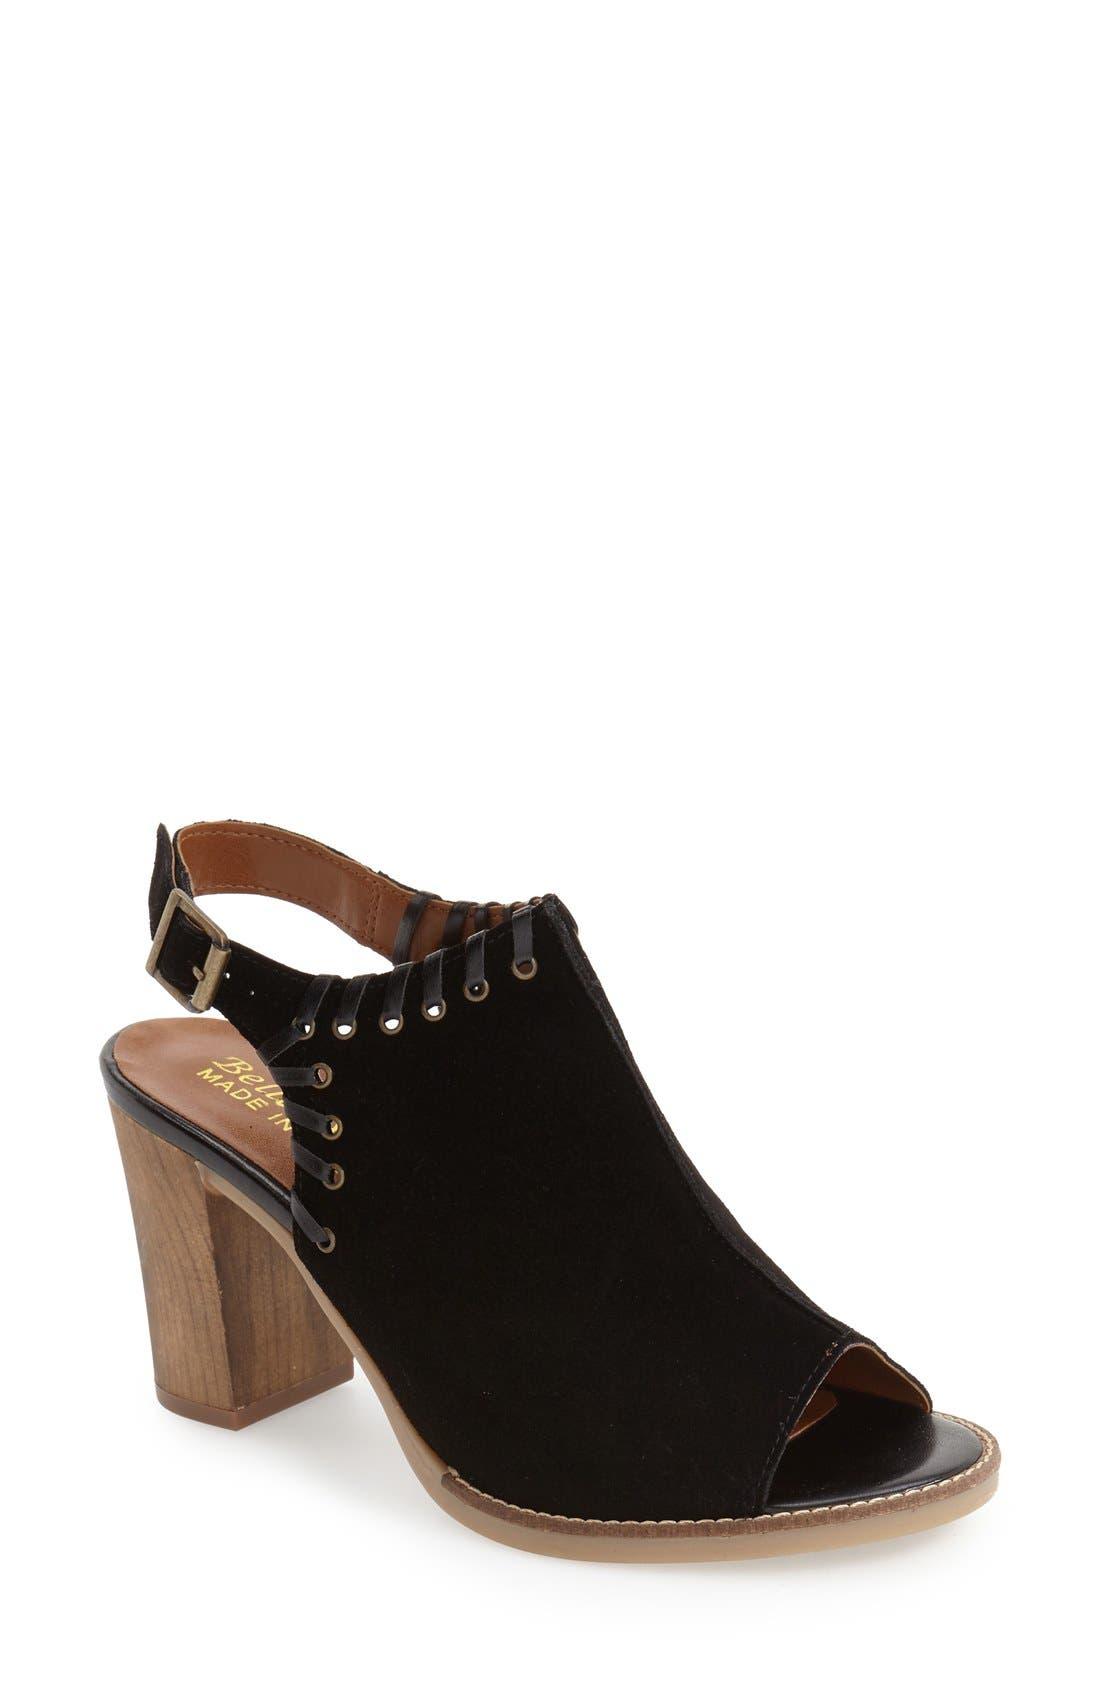 'Ora' Block Heel Slingback Sandal,                         Main,                         color, Black Suede